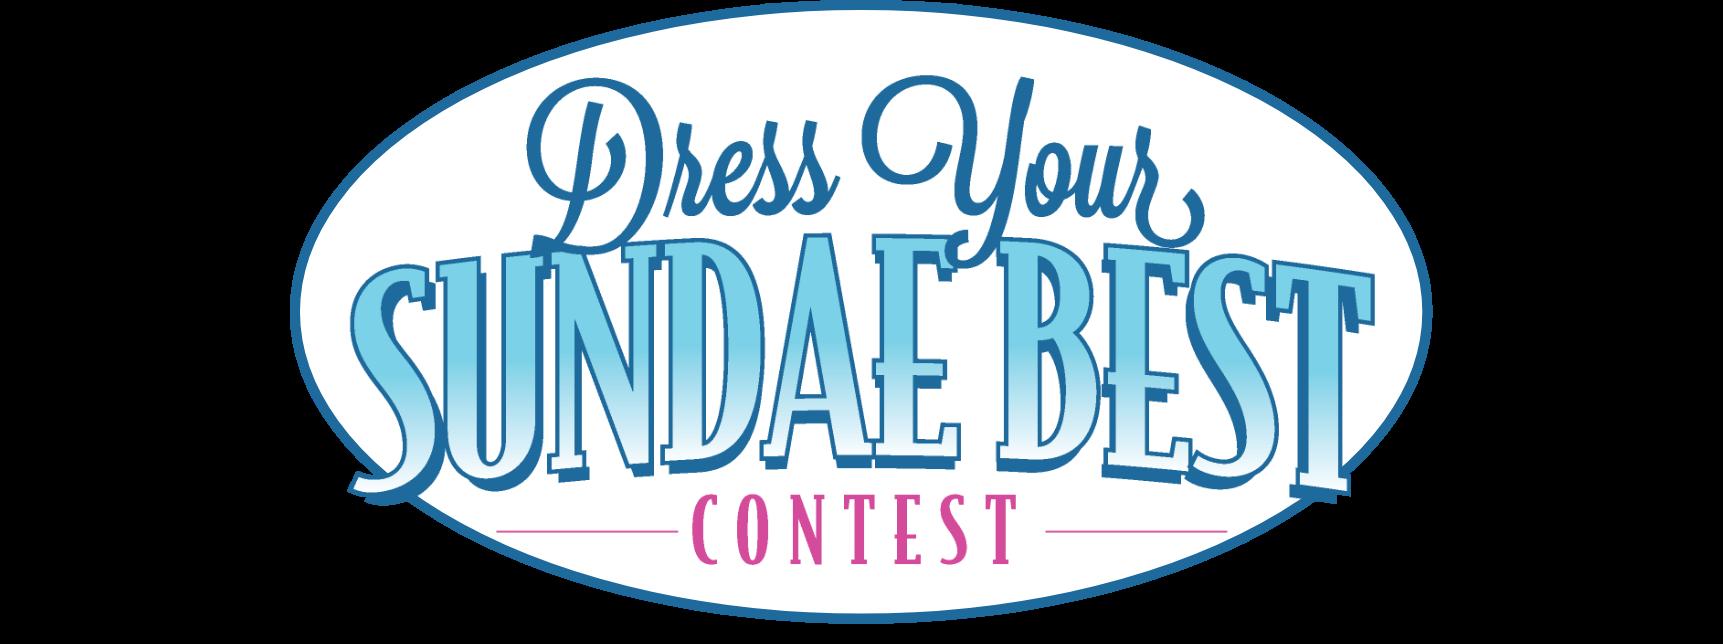 Dress Your Sundae Best Contest